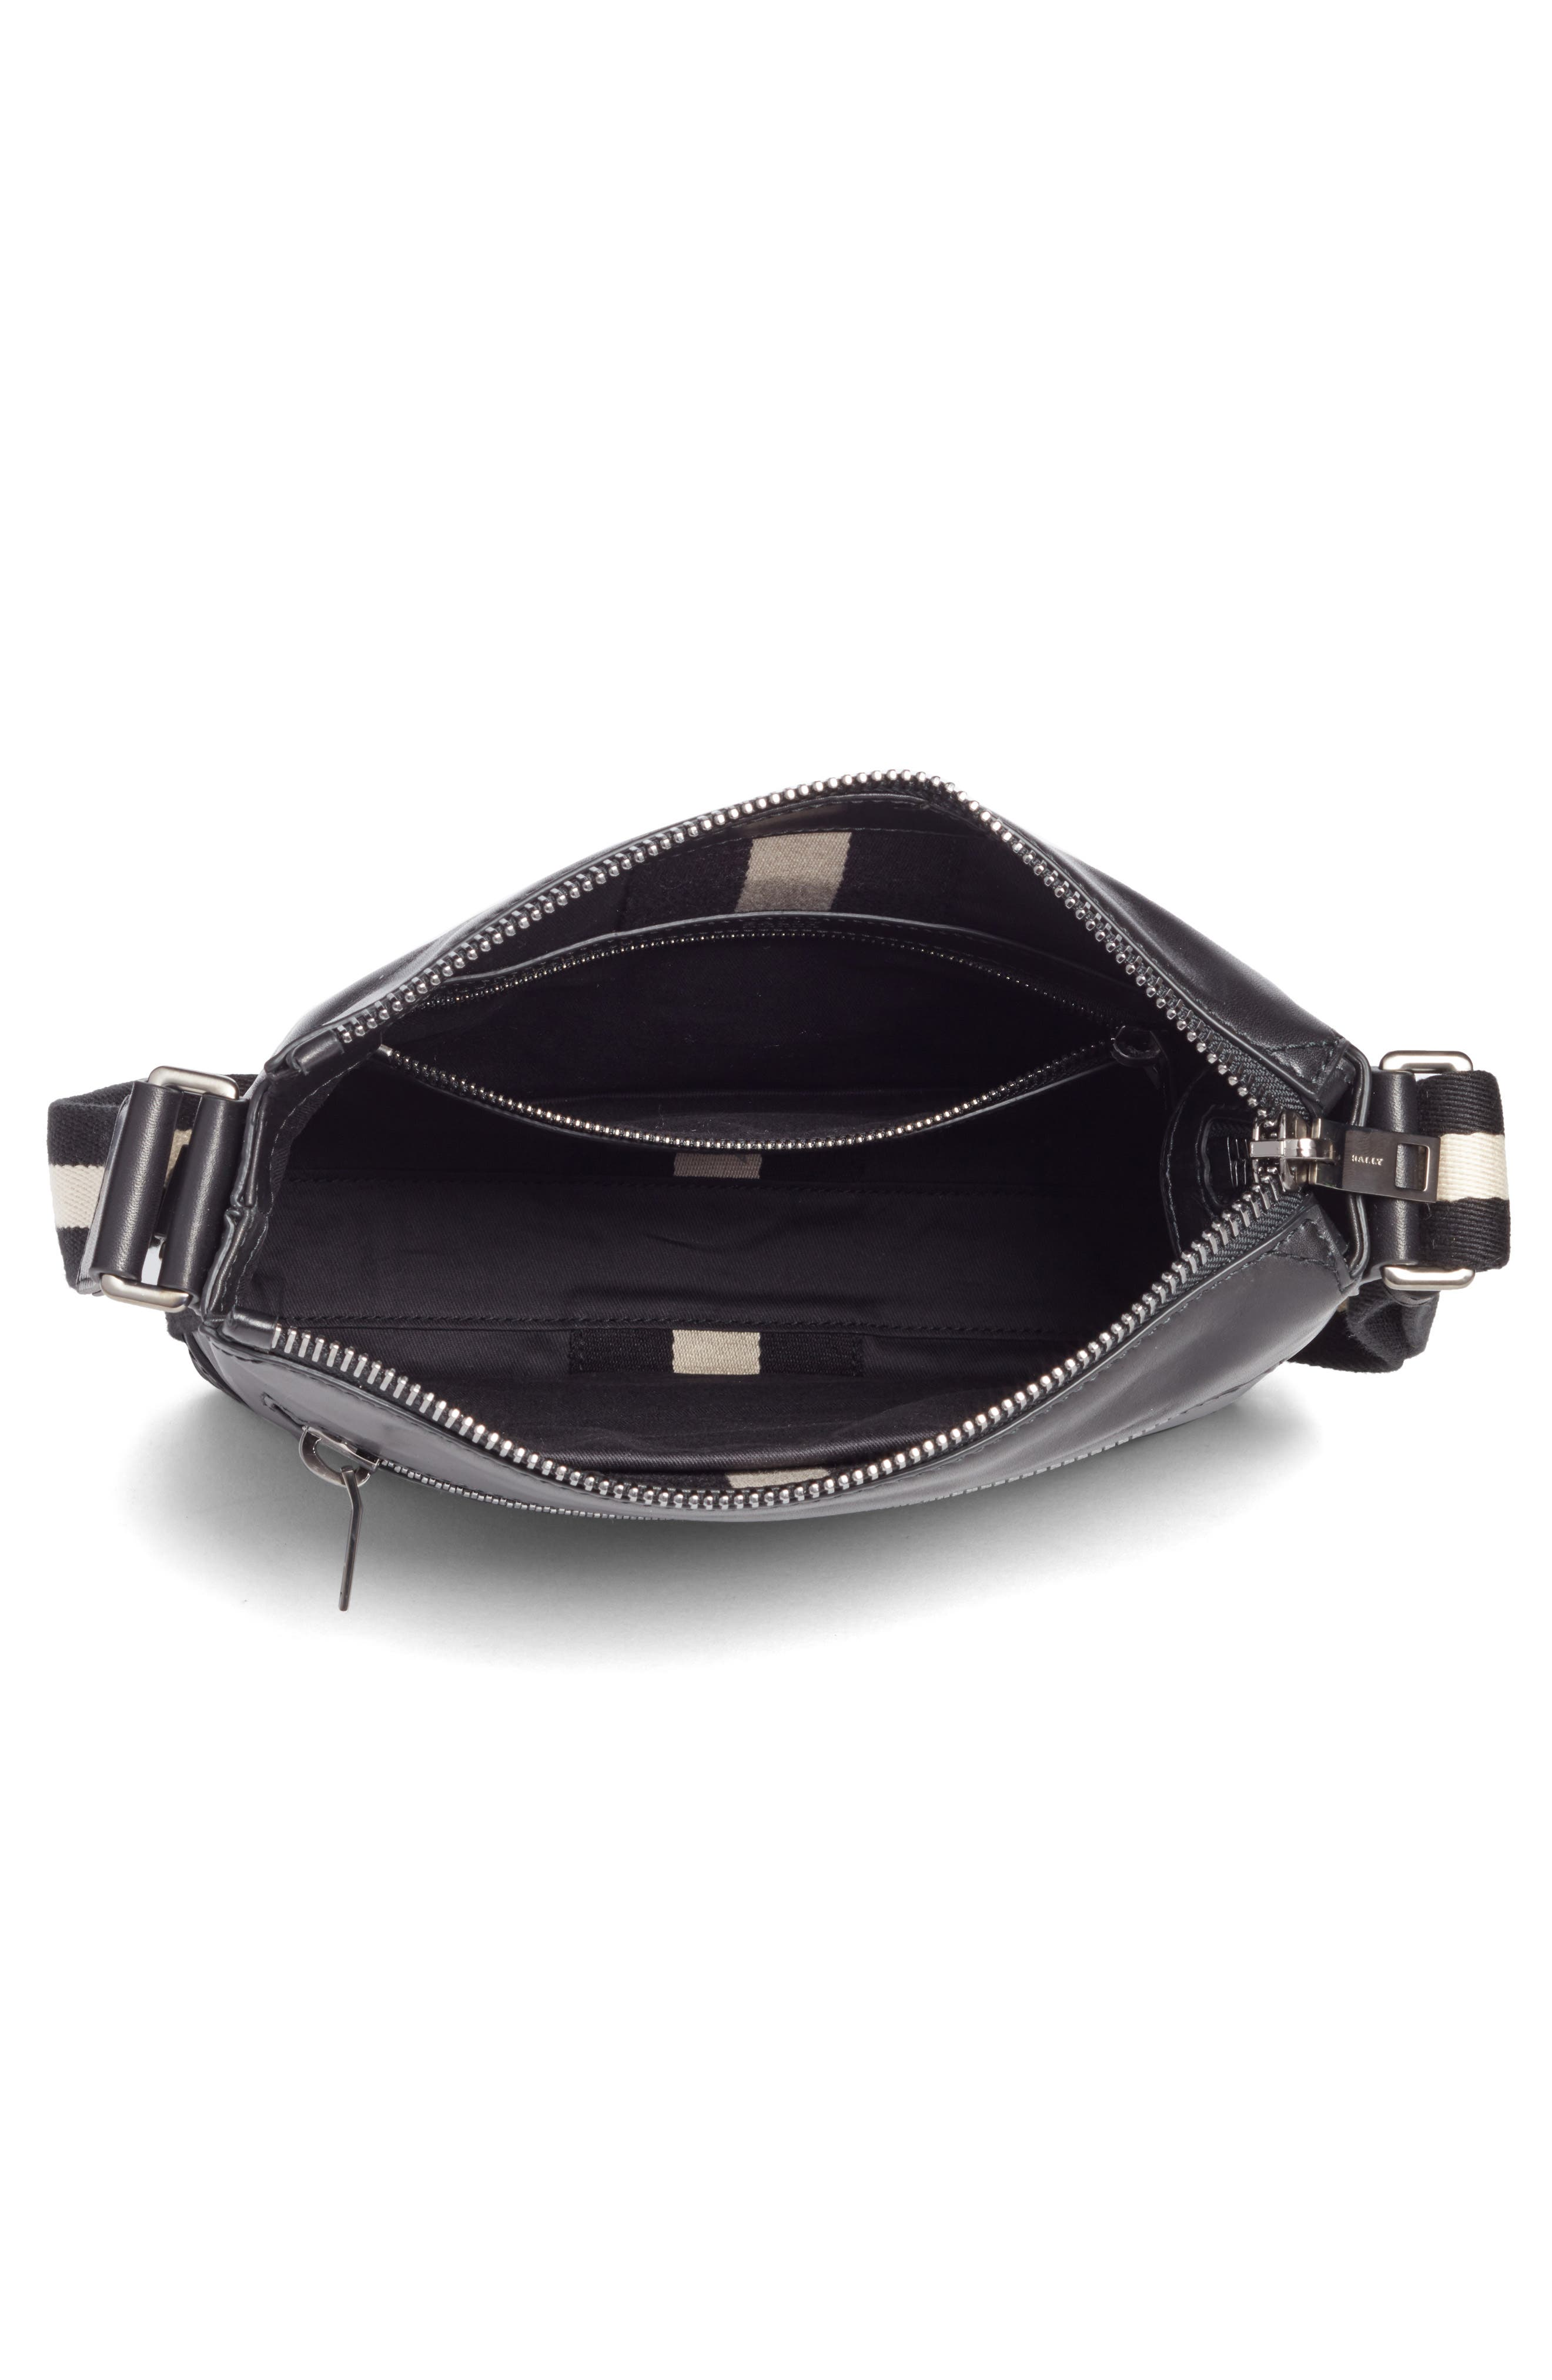 BALLY,                             Trezzini Leather Crossbody Bag,                             Alternate thumbnail 4, color,                             001